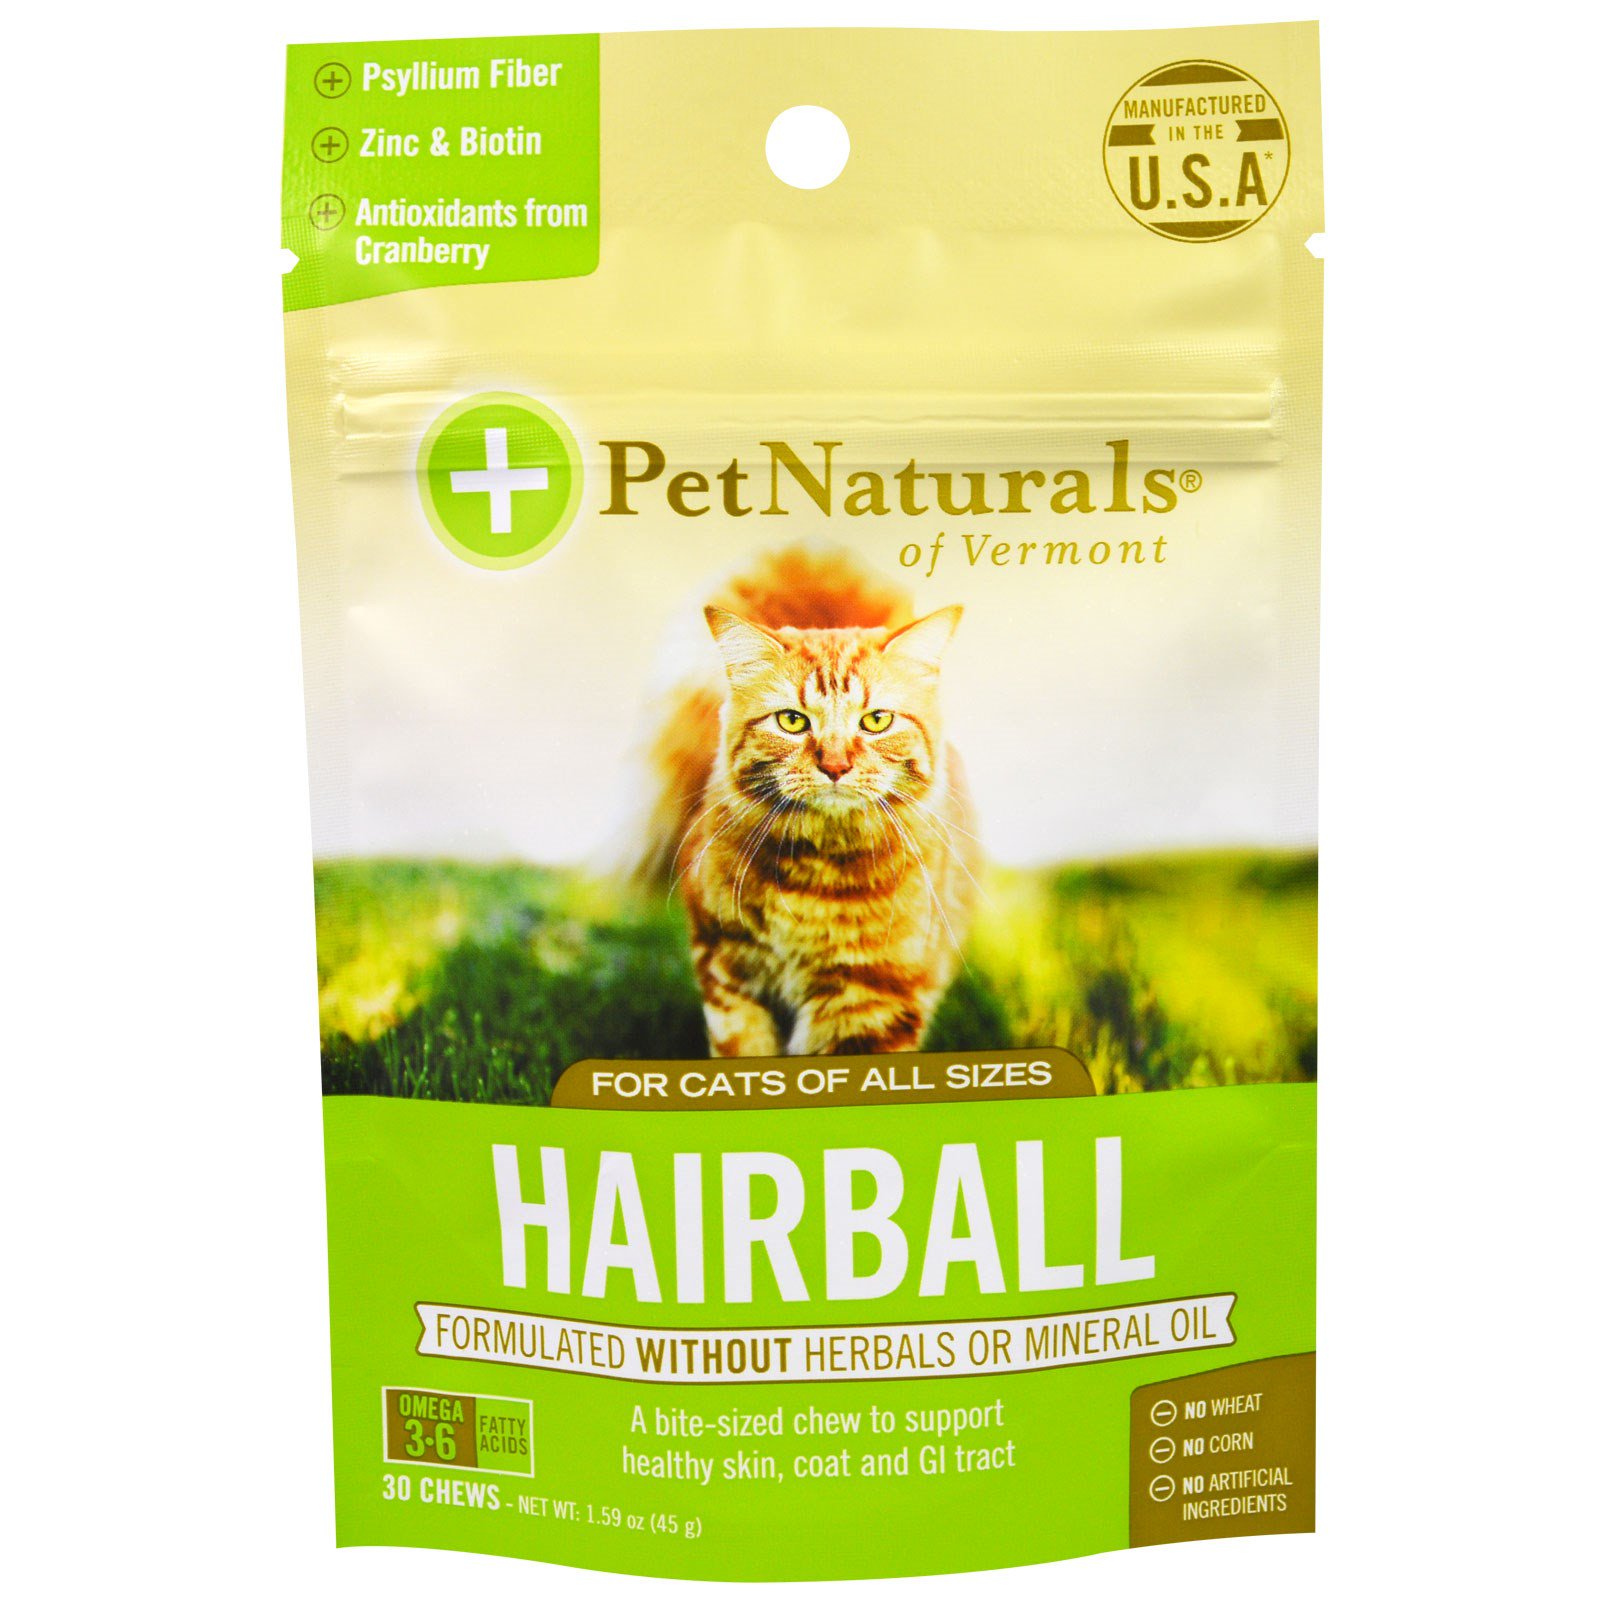 Pet Naturals of Vermont, Hairball 美毛養腸咀嚼片 ,適合貓,30片,1.59 oz (45 g)